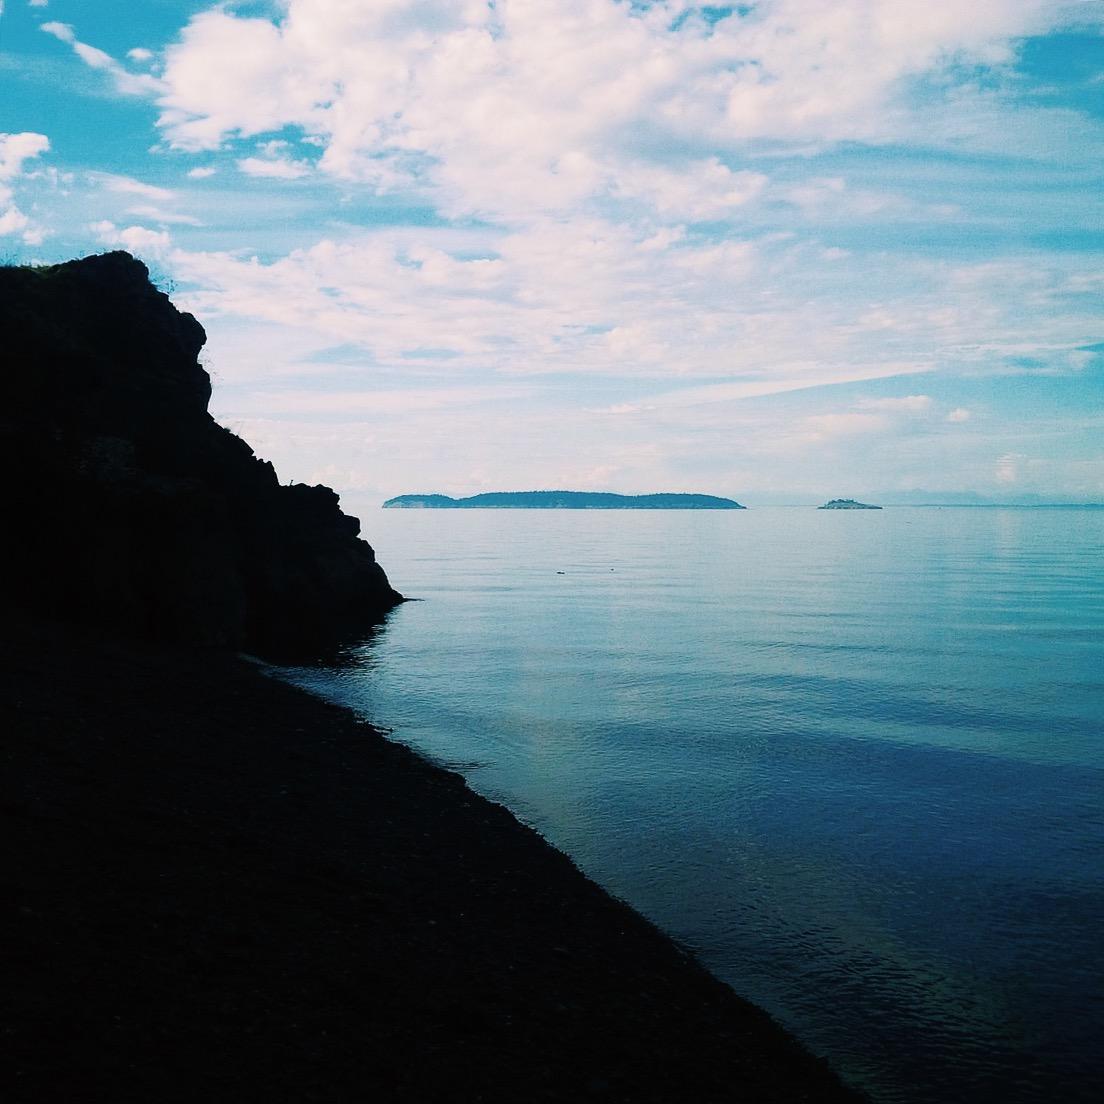 orcas island, washington state, usa